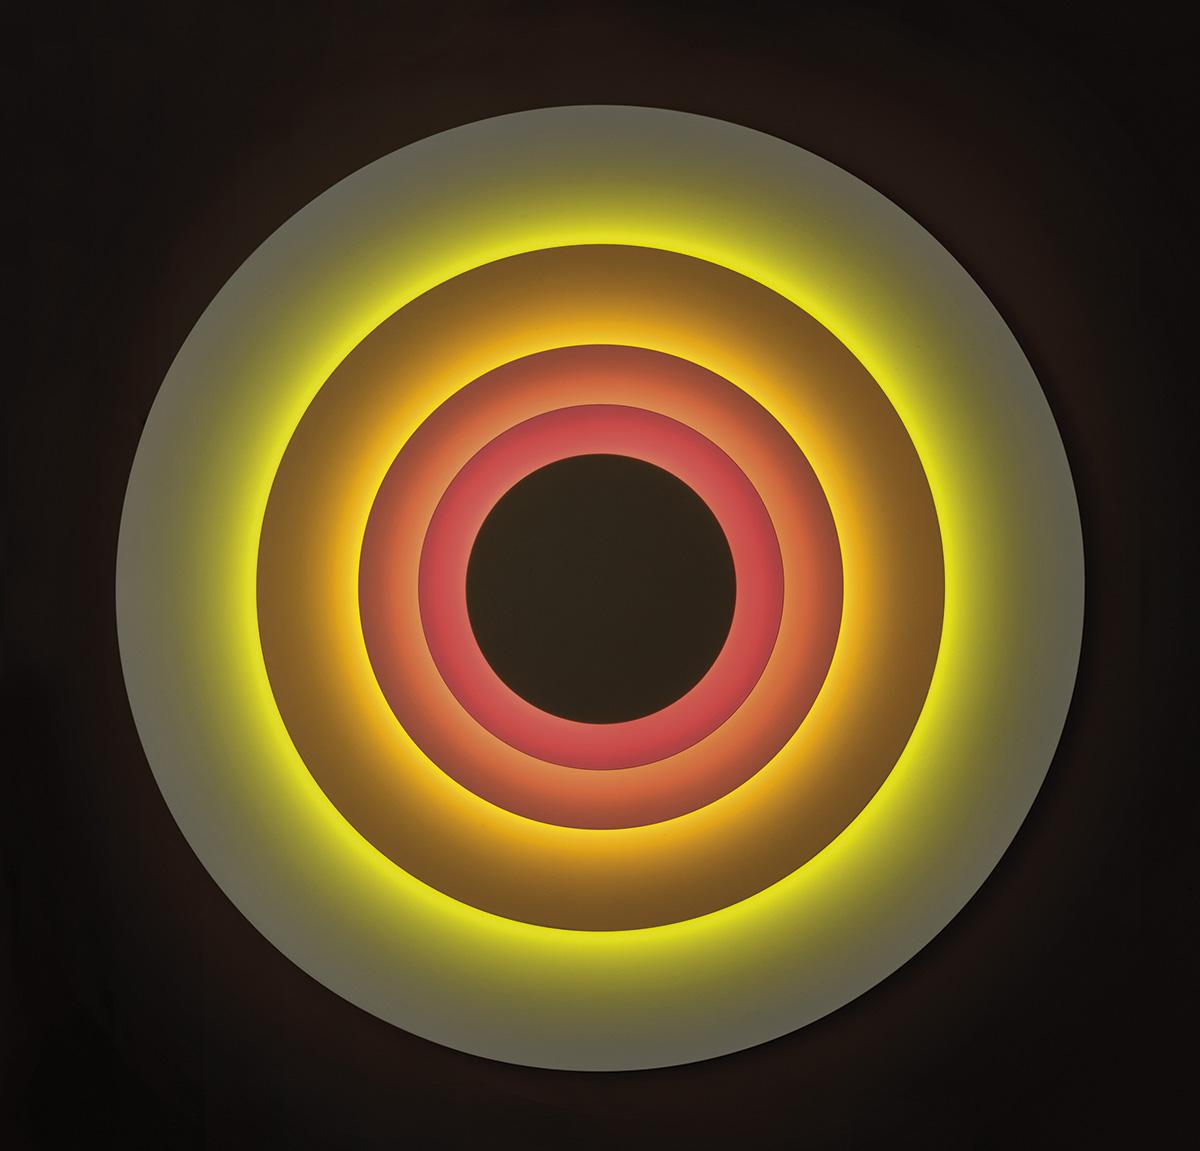 07-concentric-rob-zinn-marset